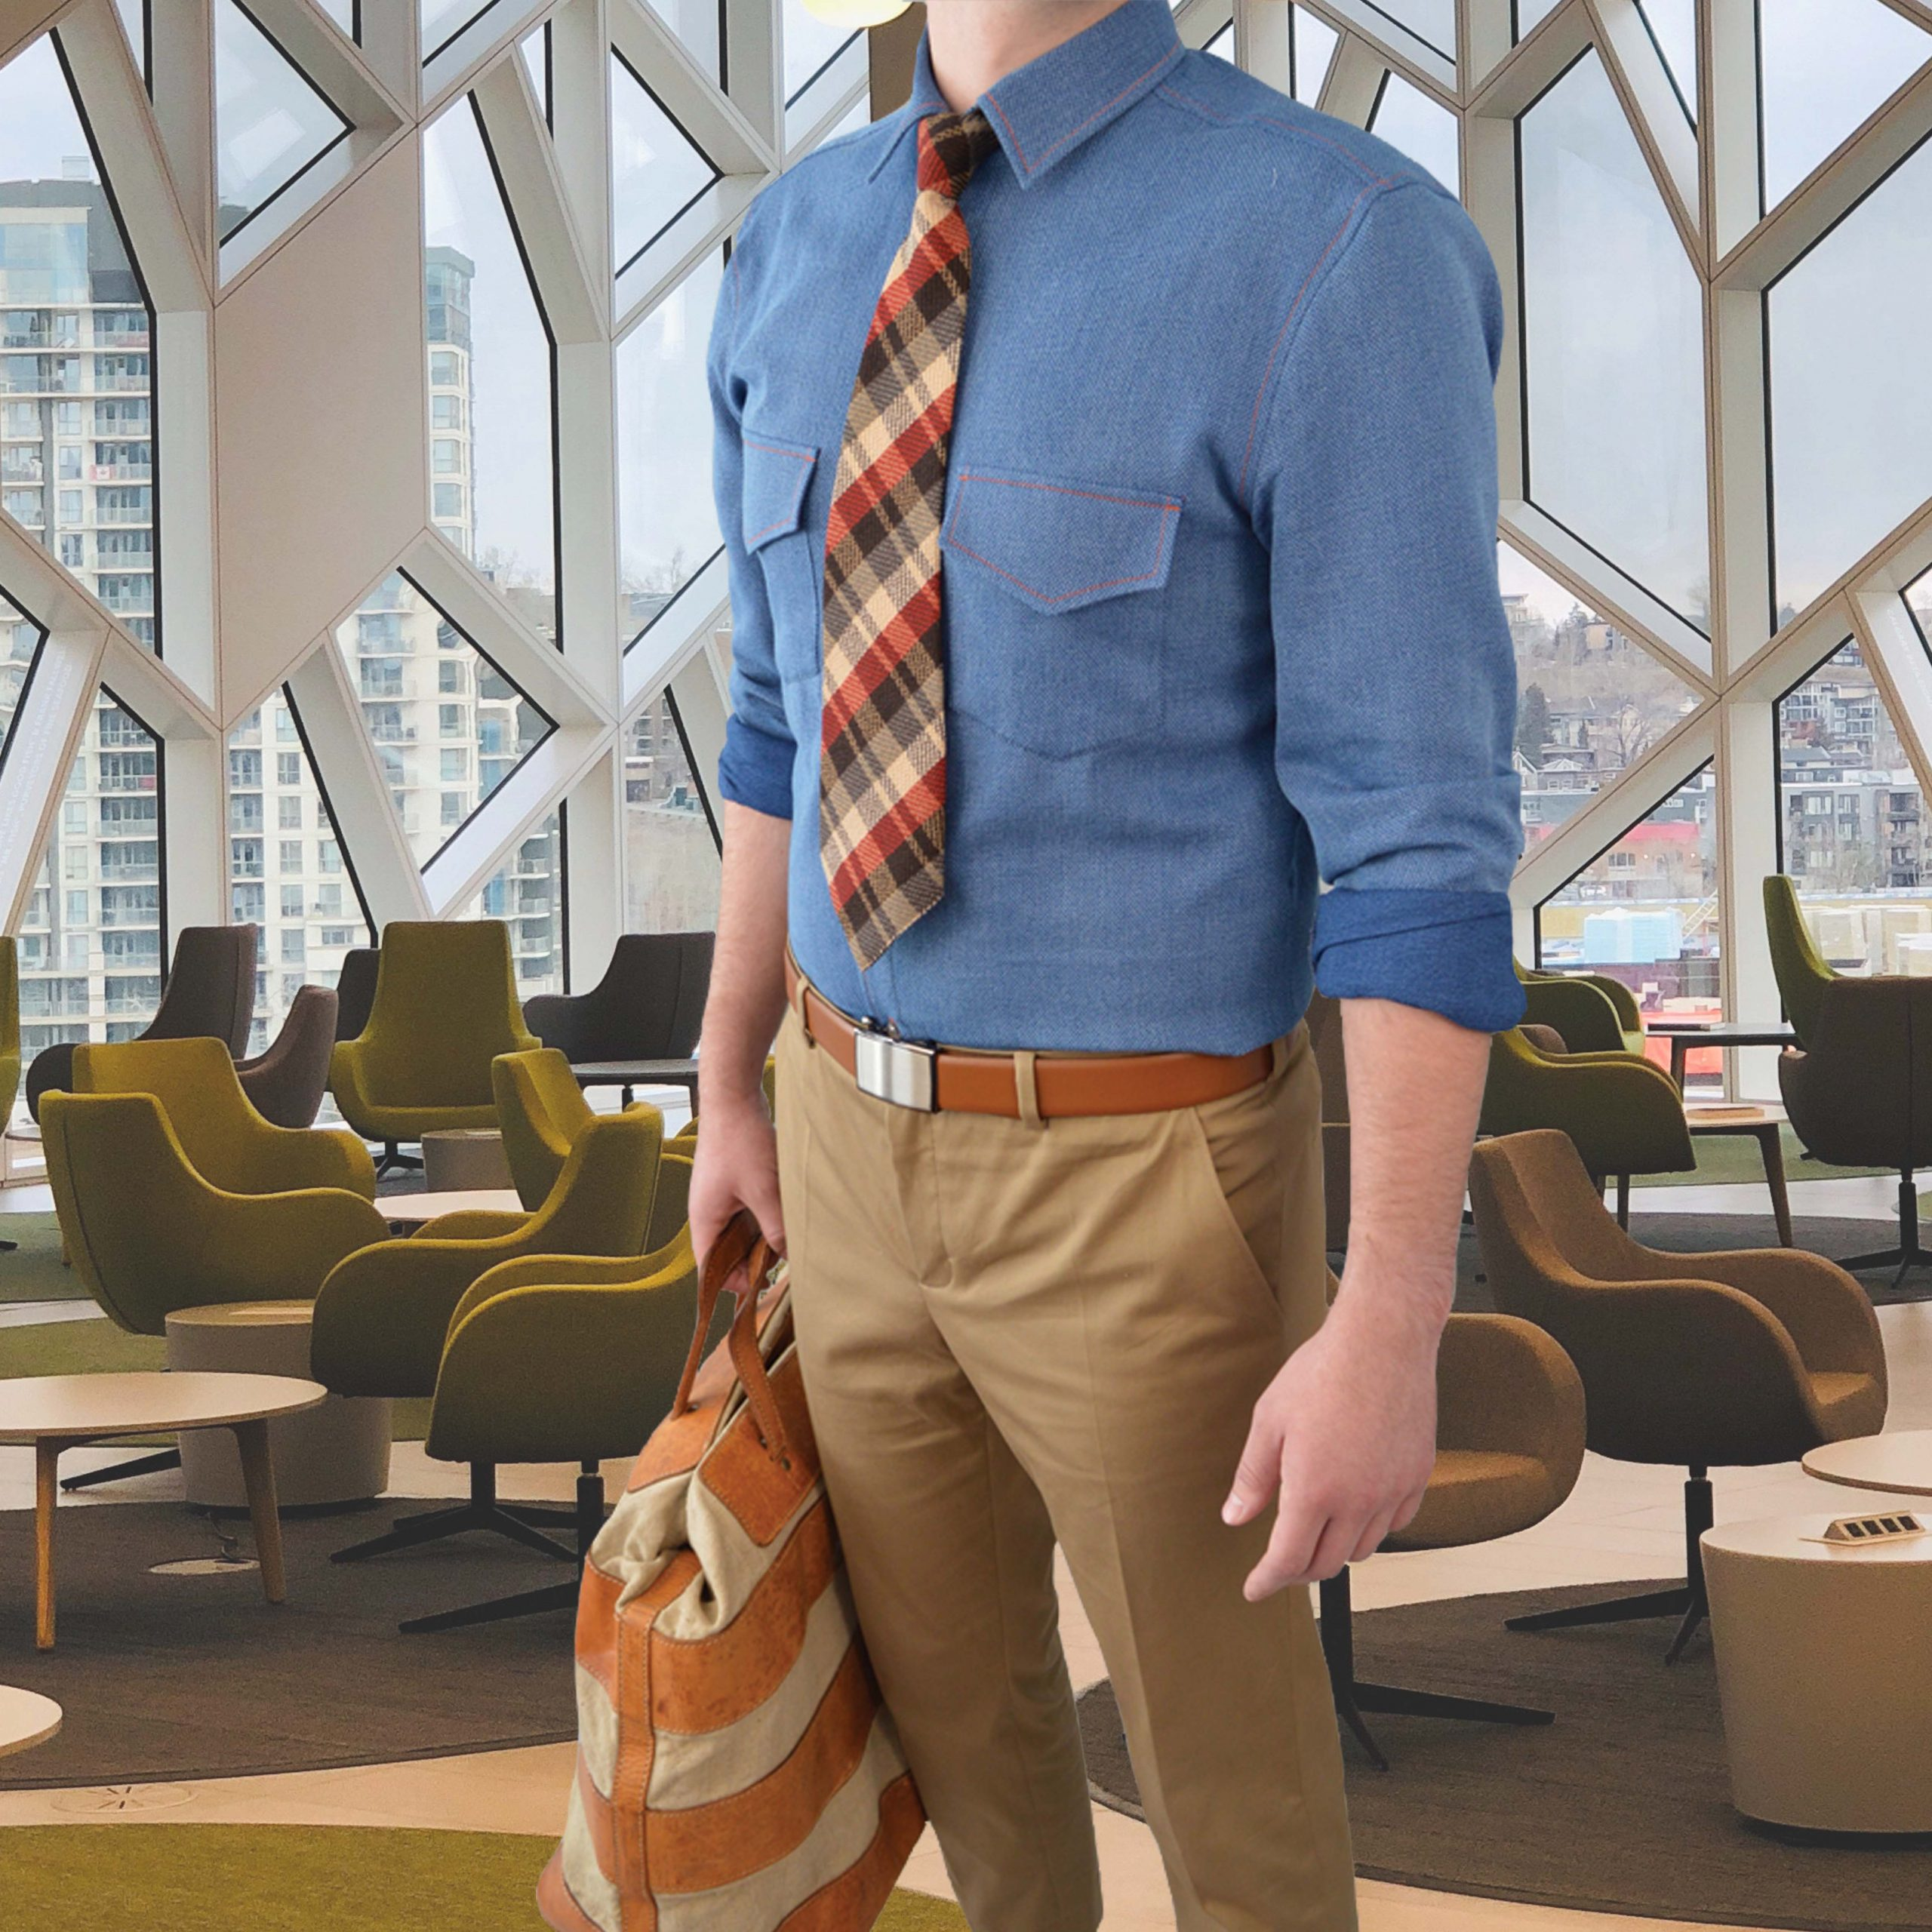 kresse-oliver-jeanshemd-herrenhemd-slim-fit-streetstyle